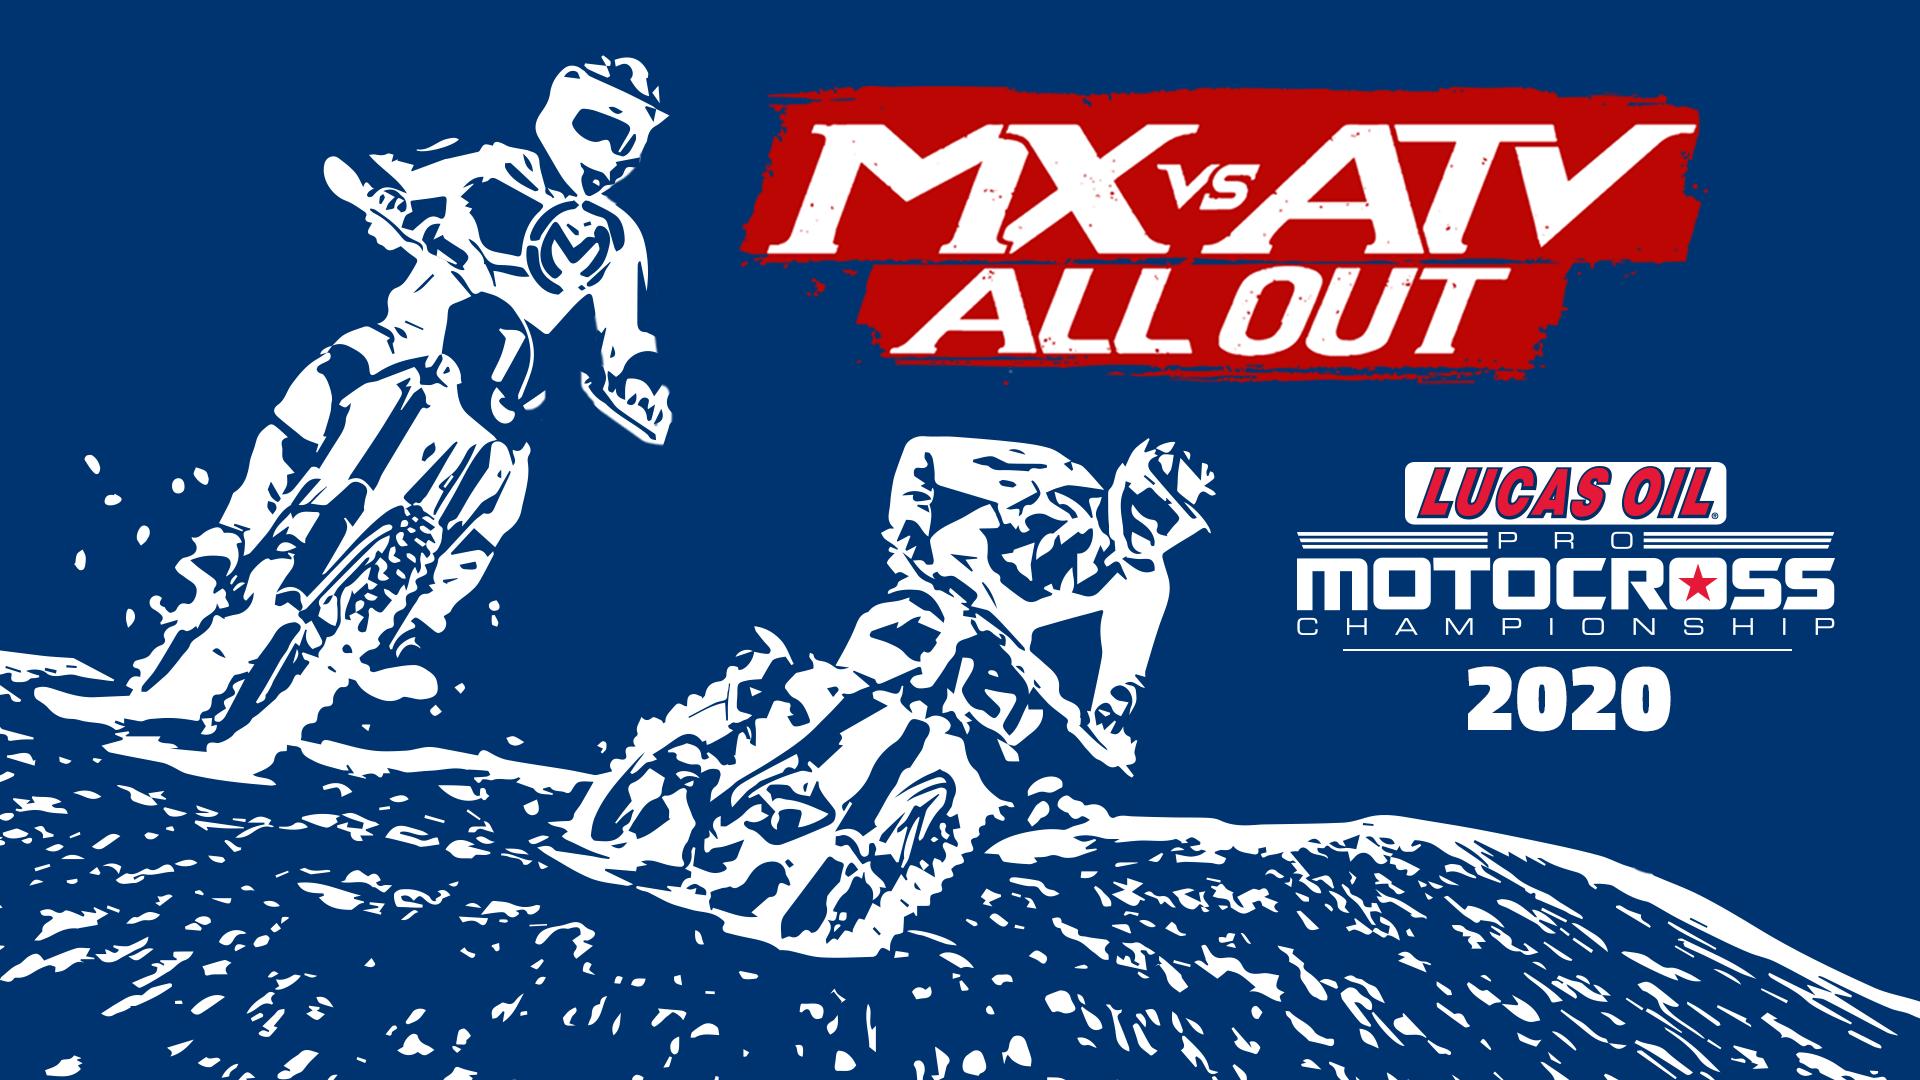 MX vs ATV All Out AMA Pro Motocross Championship